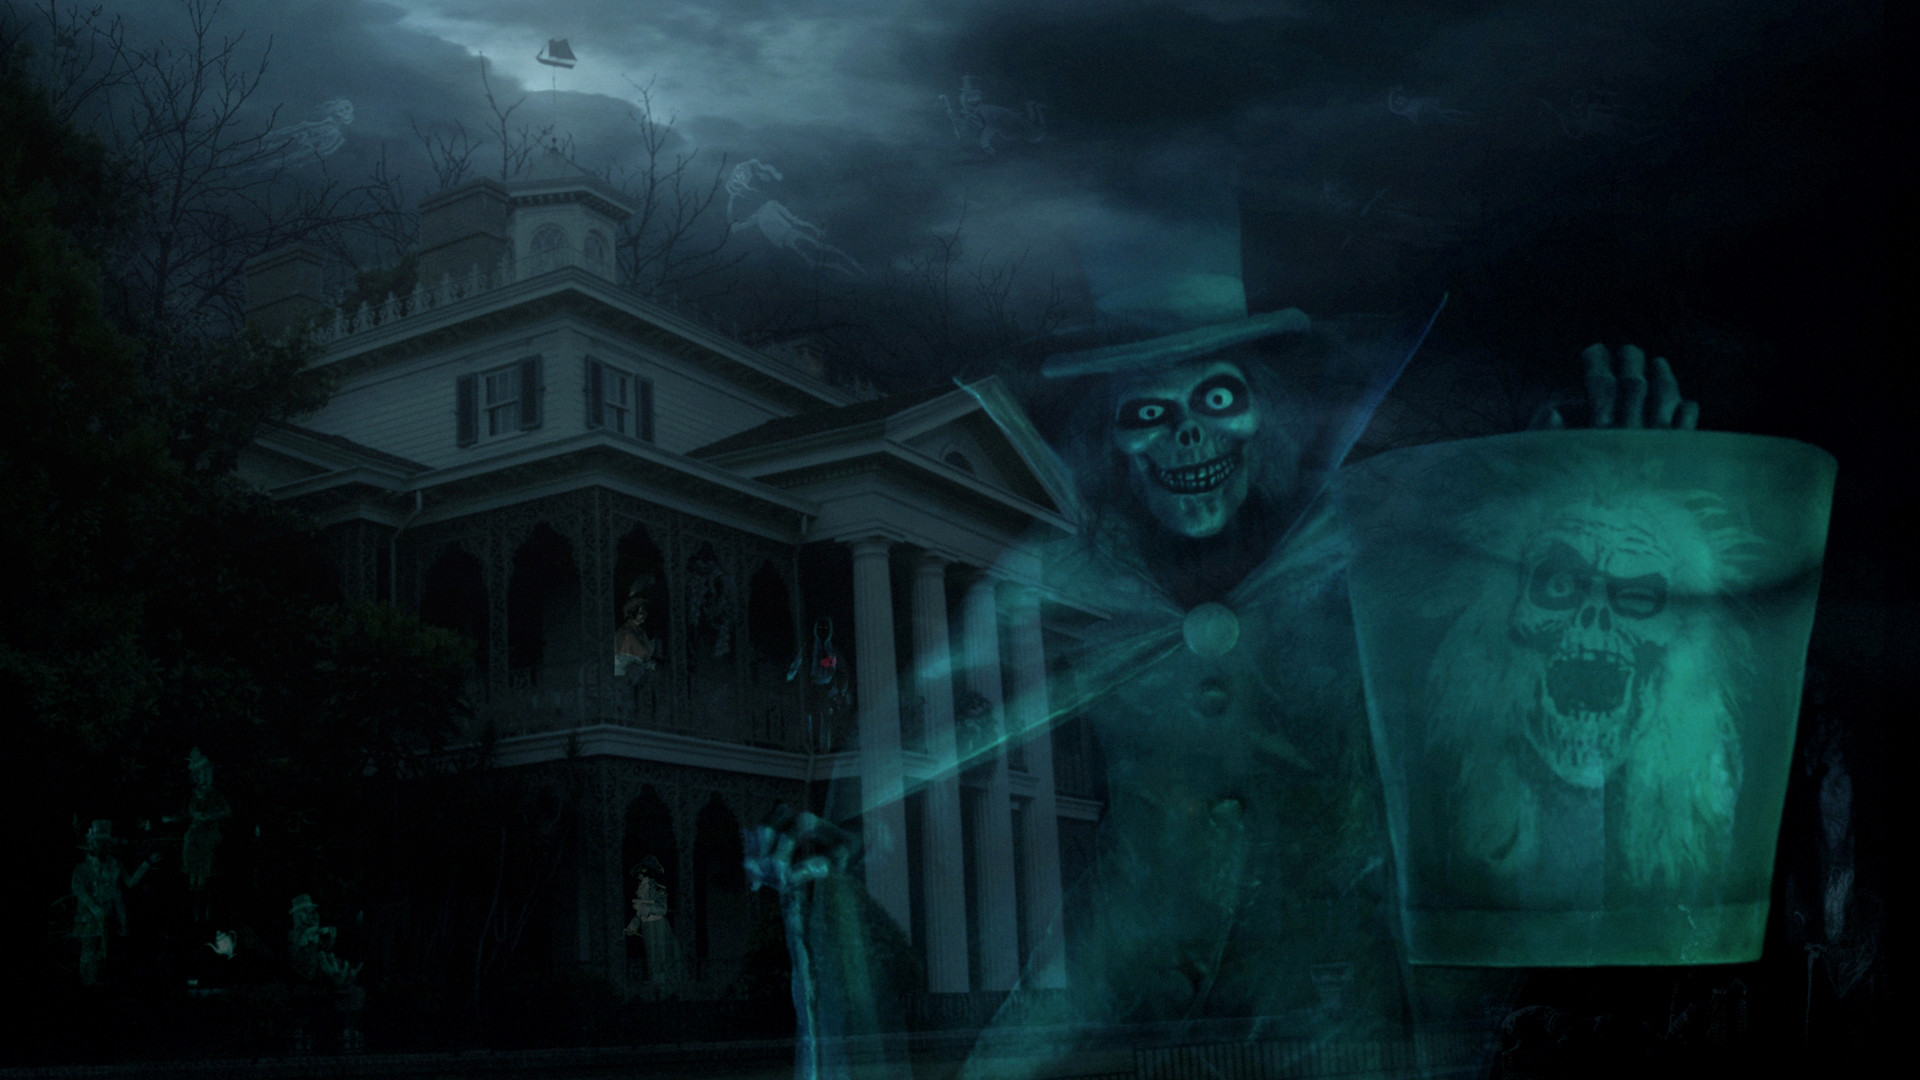 Creeper Wallpaper Hd Haunted House Wallpaper Desktop 183 ①